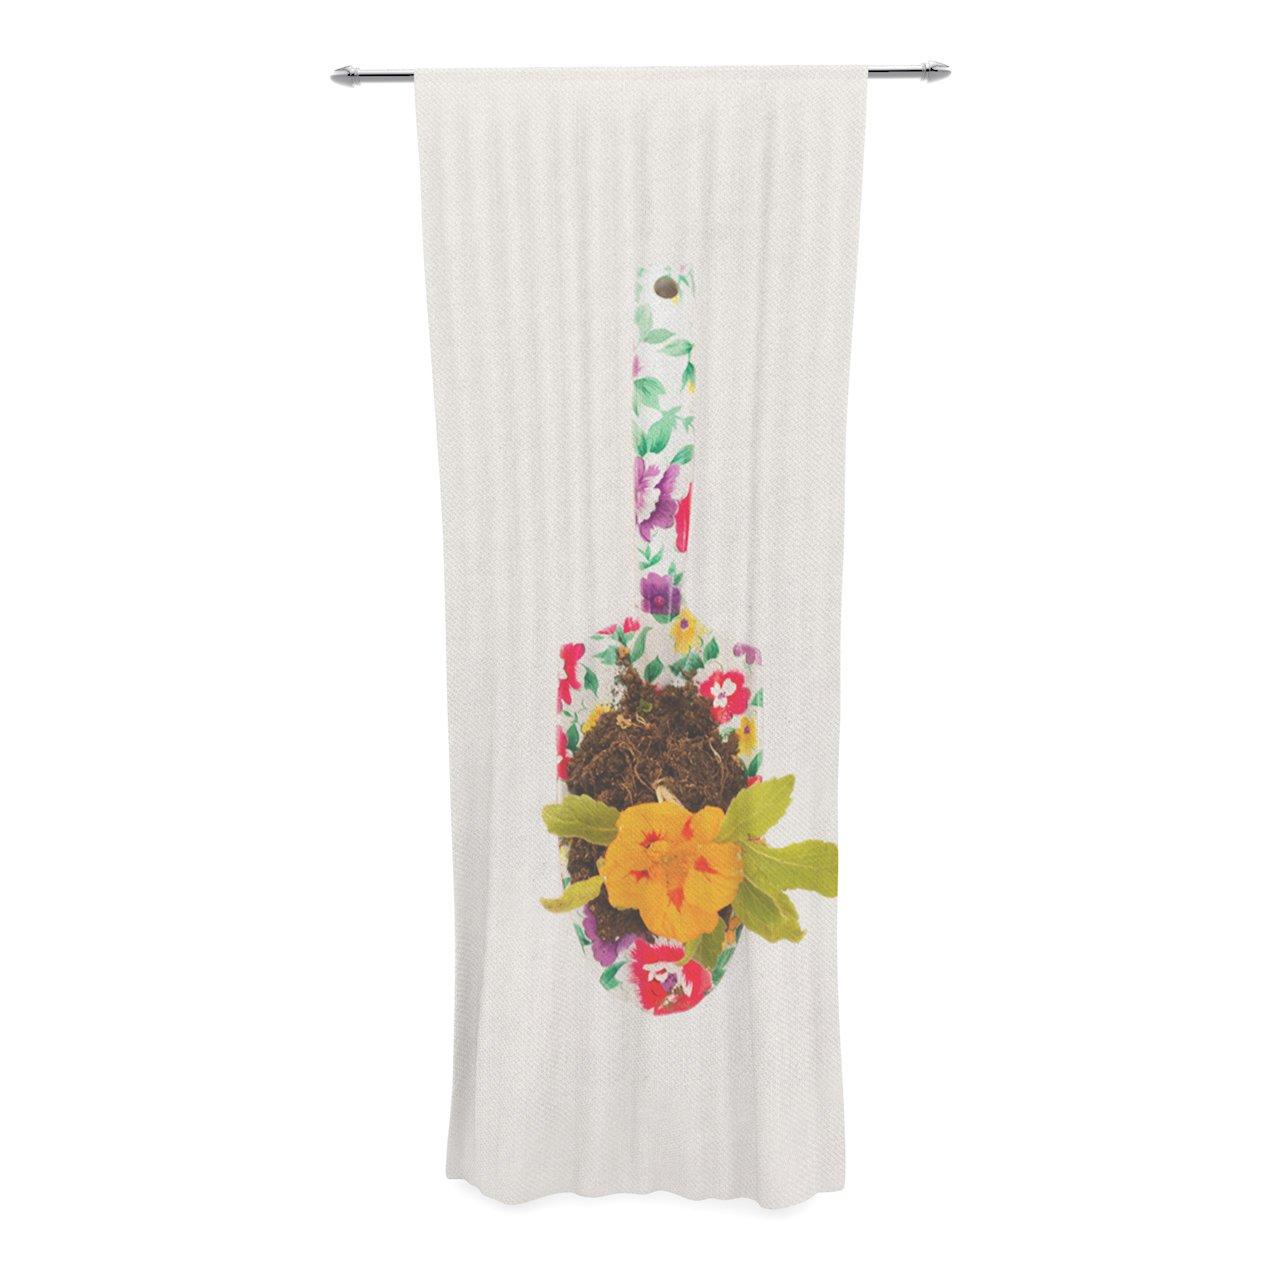 Kess InHouse Ingrid Beddoes The Gardener Sheer Curtains 30 x 84